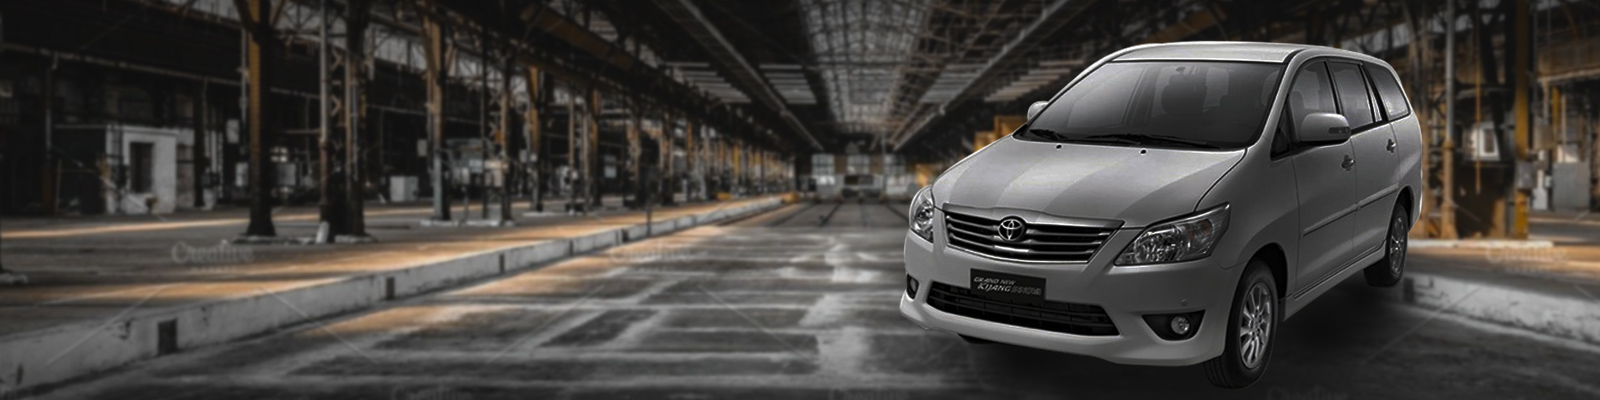 car-hire-services-in-rameswaram